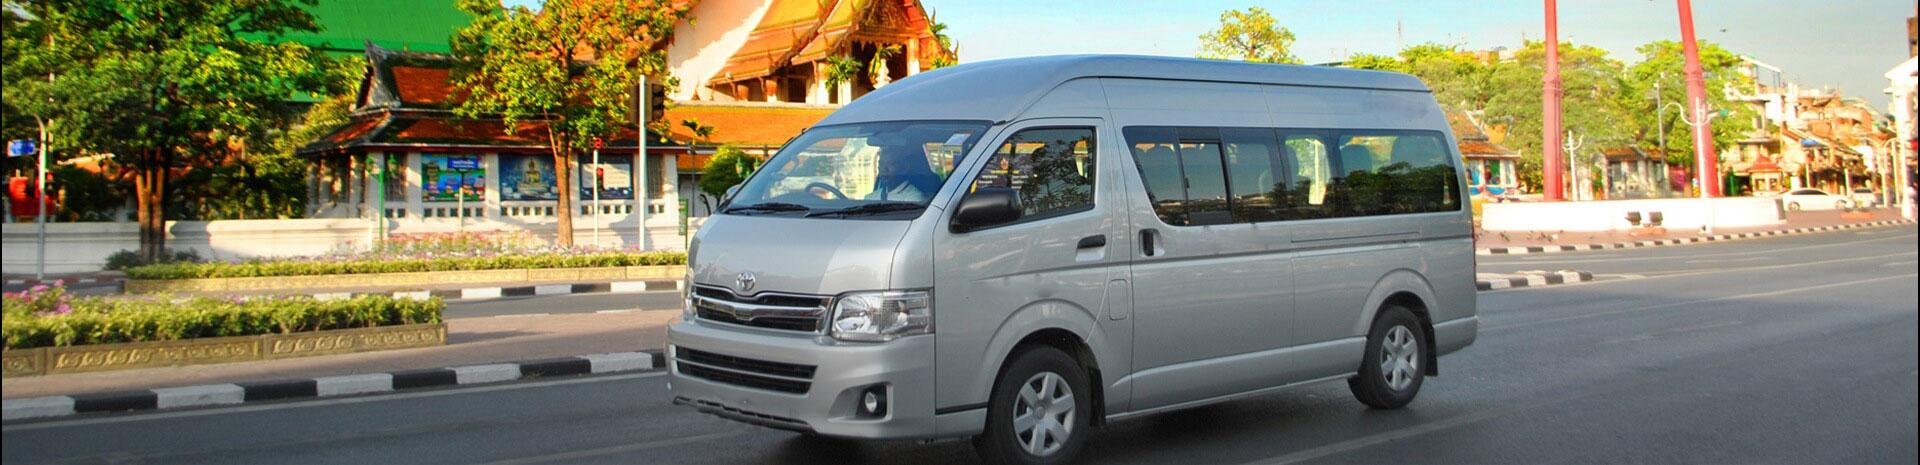 Thailand Taxi & Bus - Transport